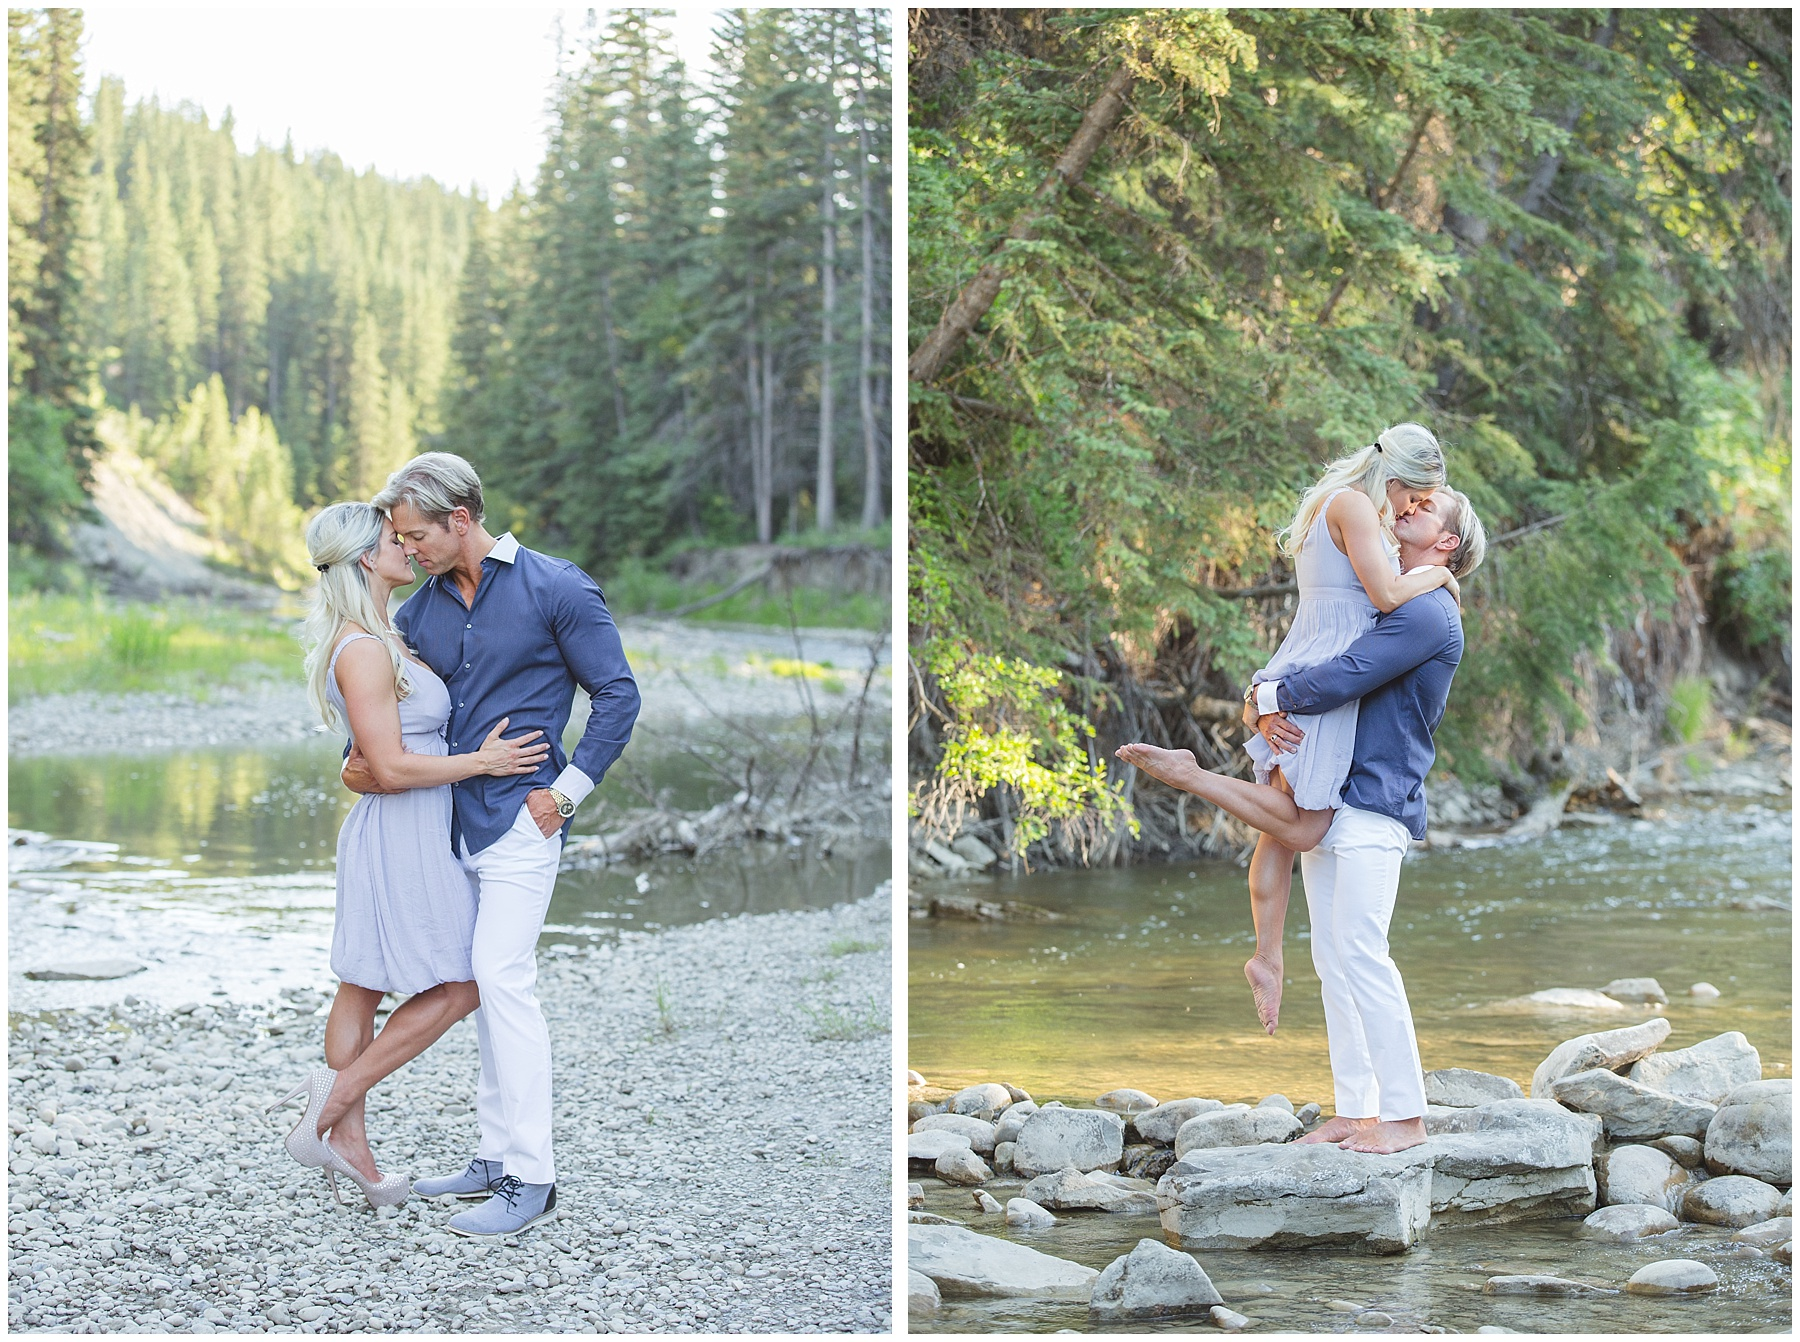 Calgary_Engagement_Photography_Fish_Creek_Park_01.jpg